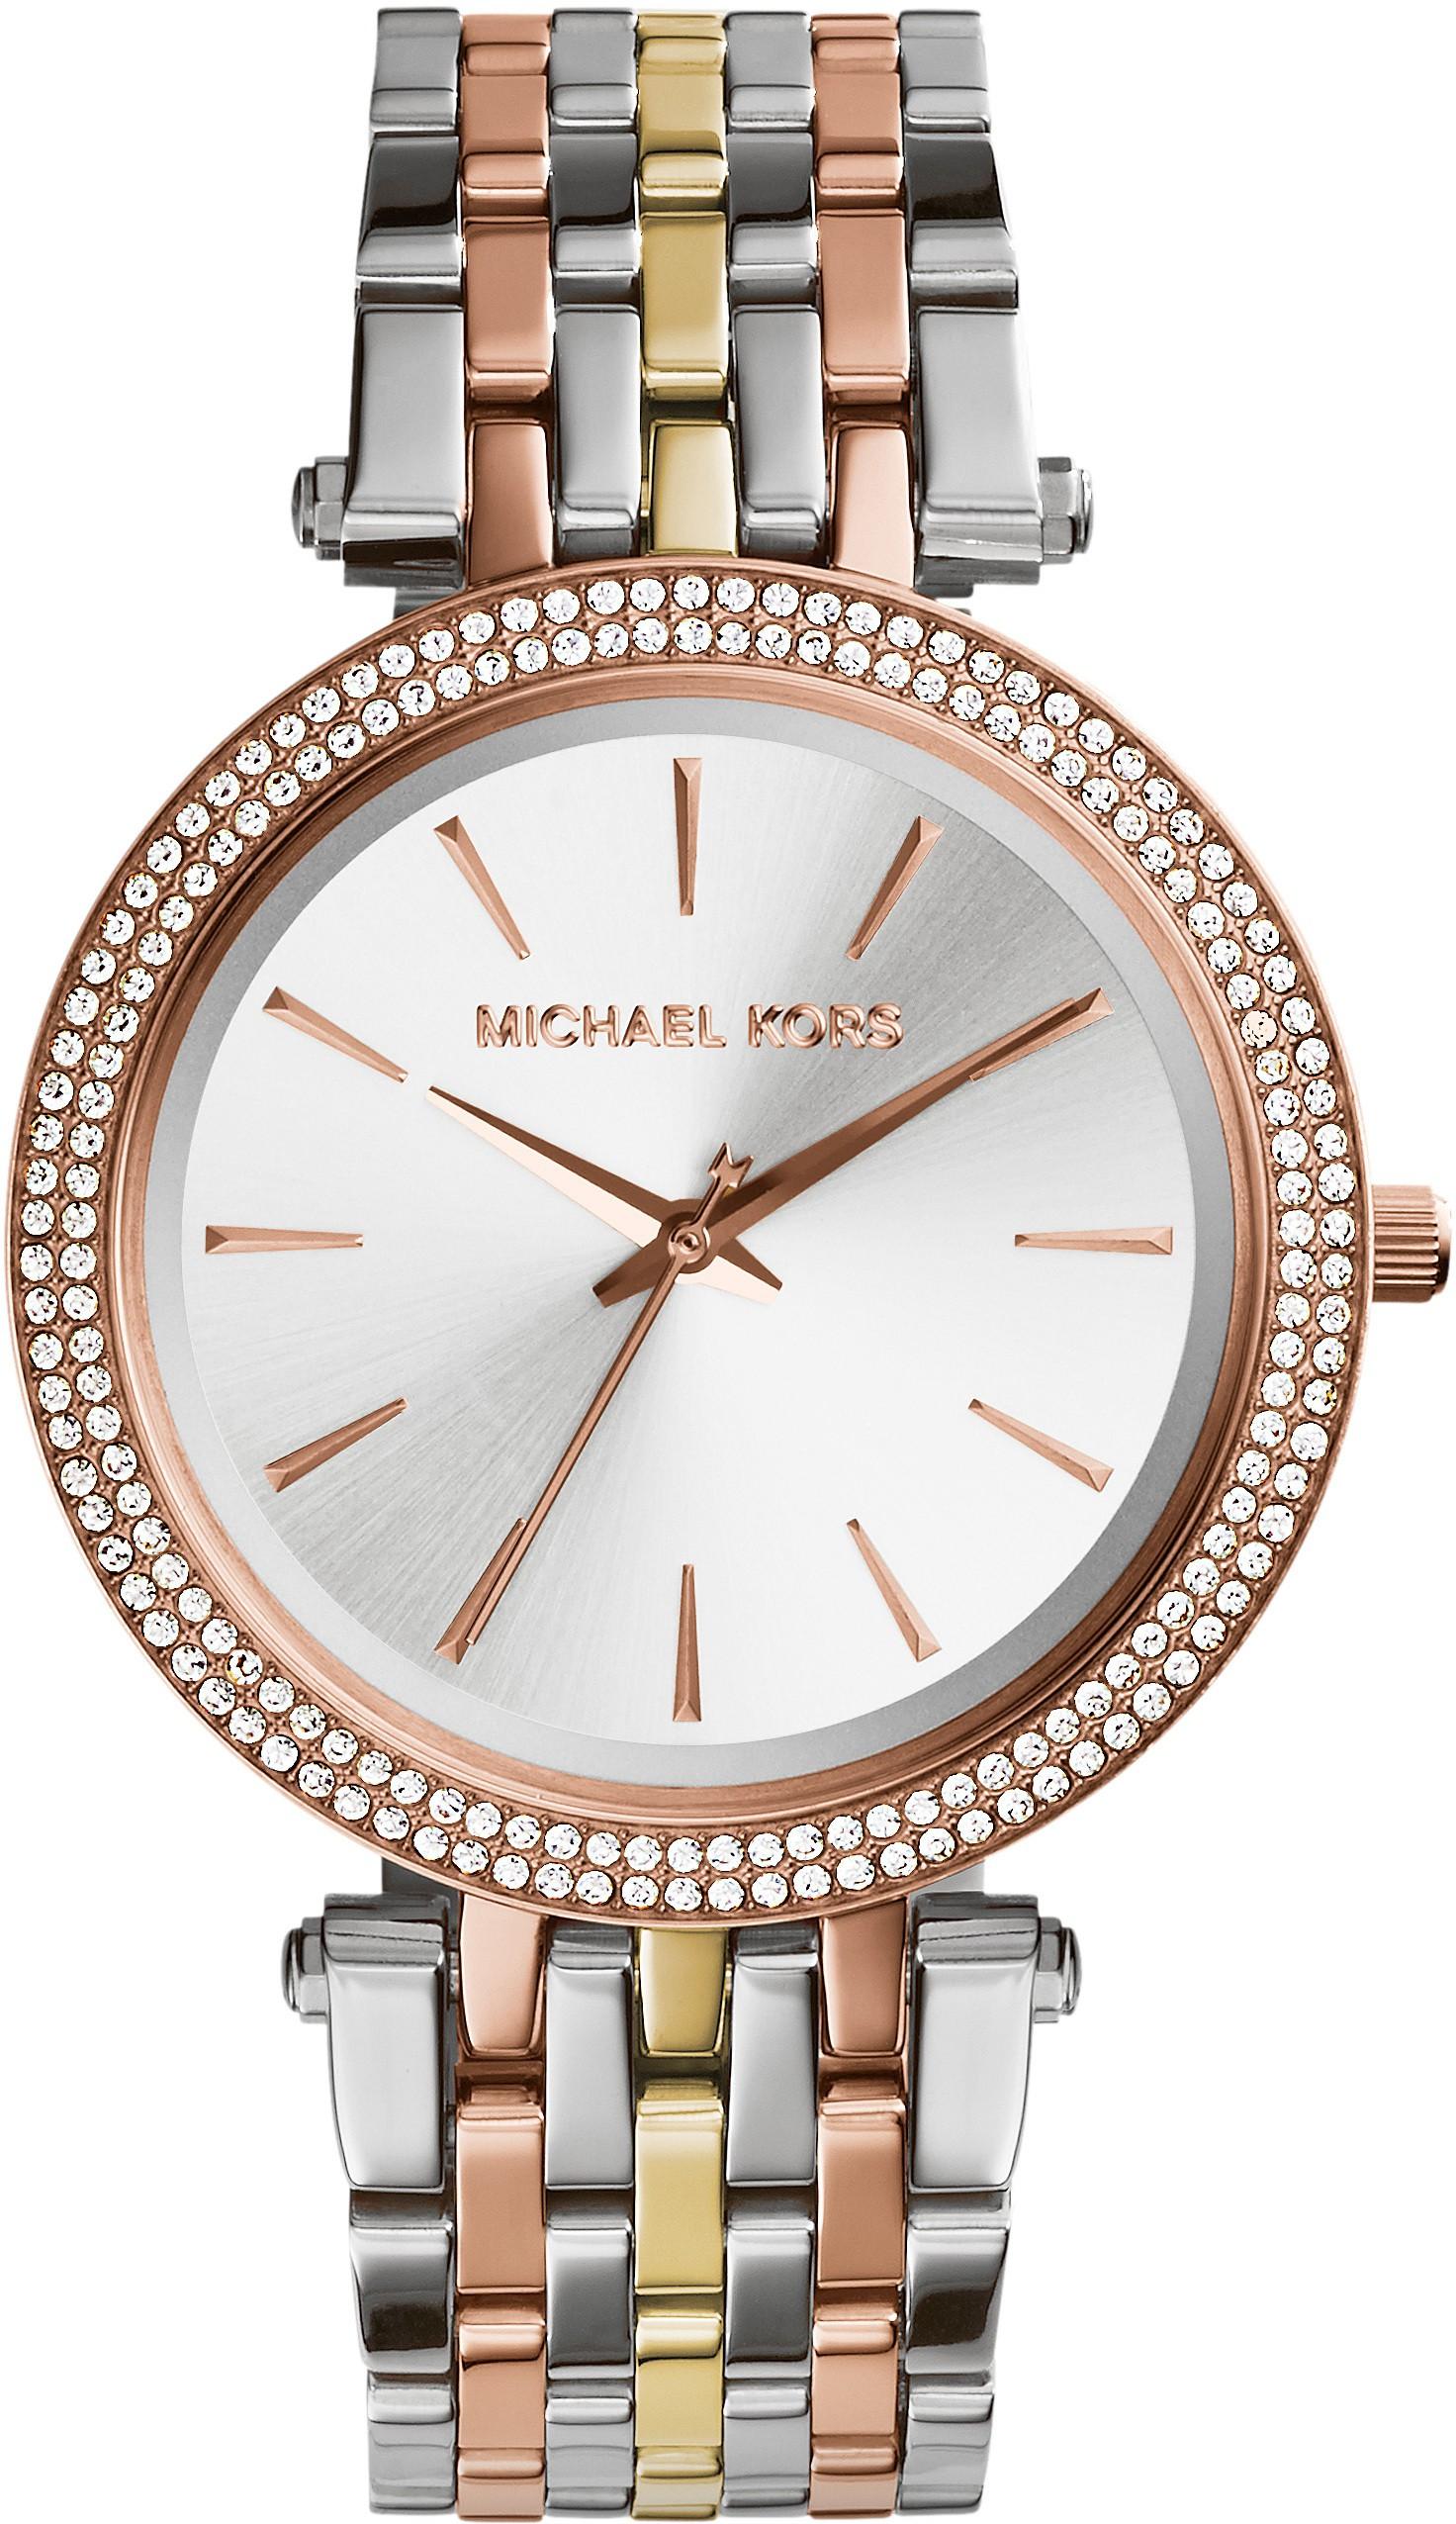 michael kors watch price in india парфюм